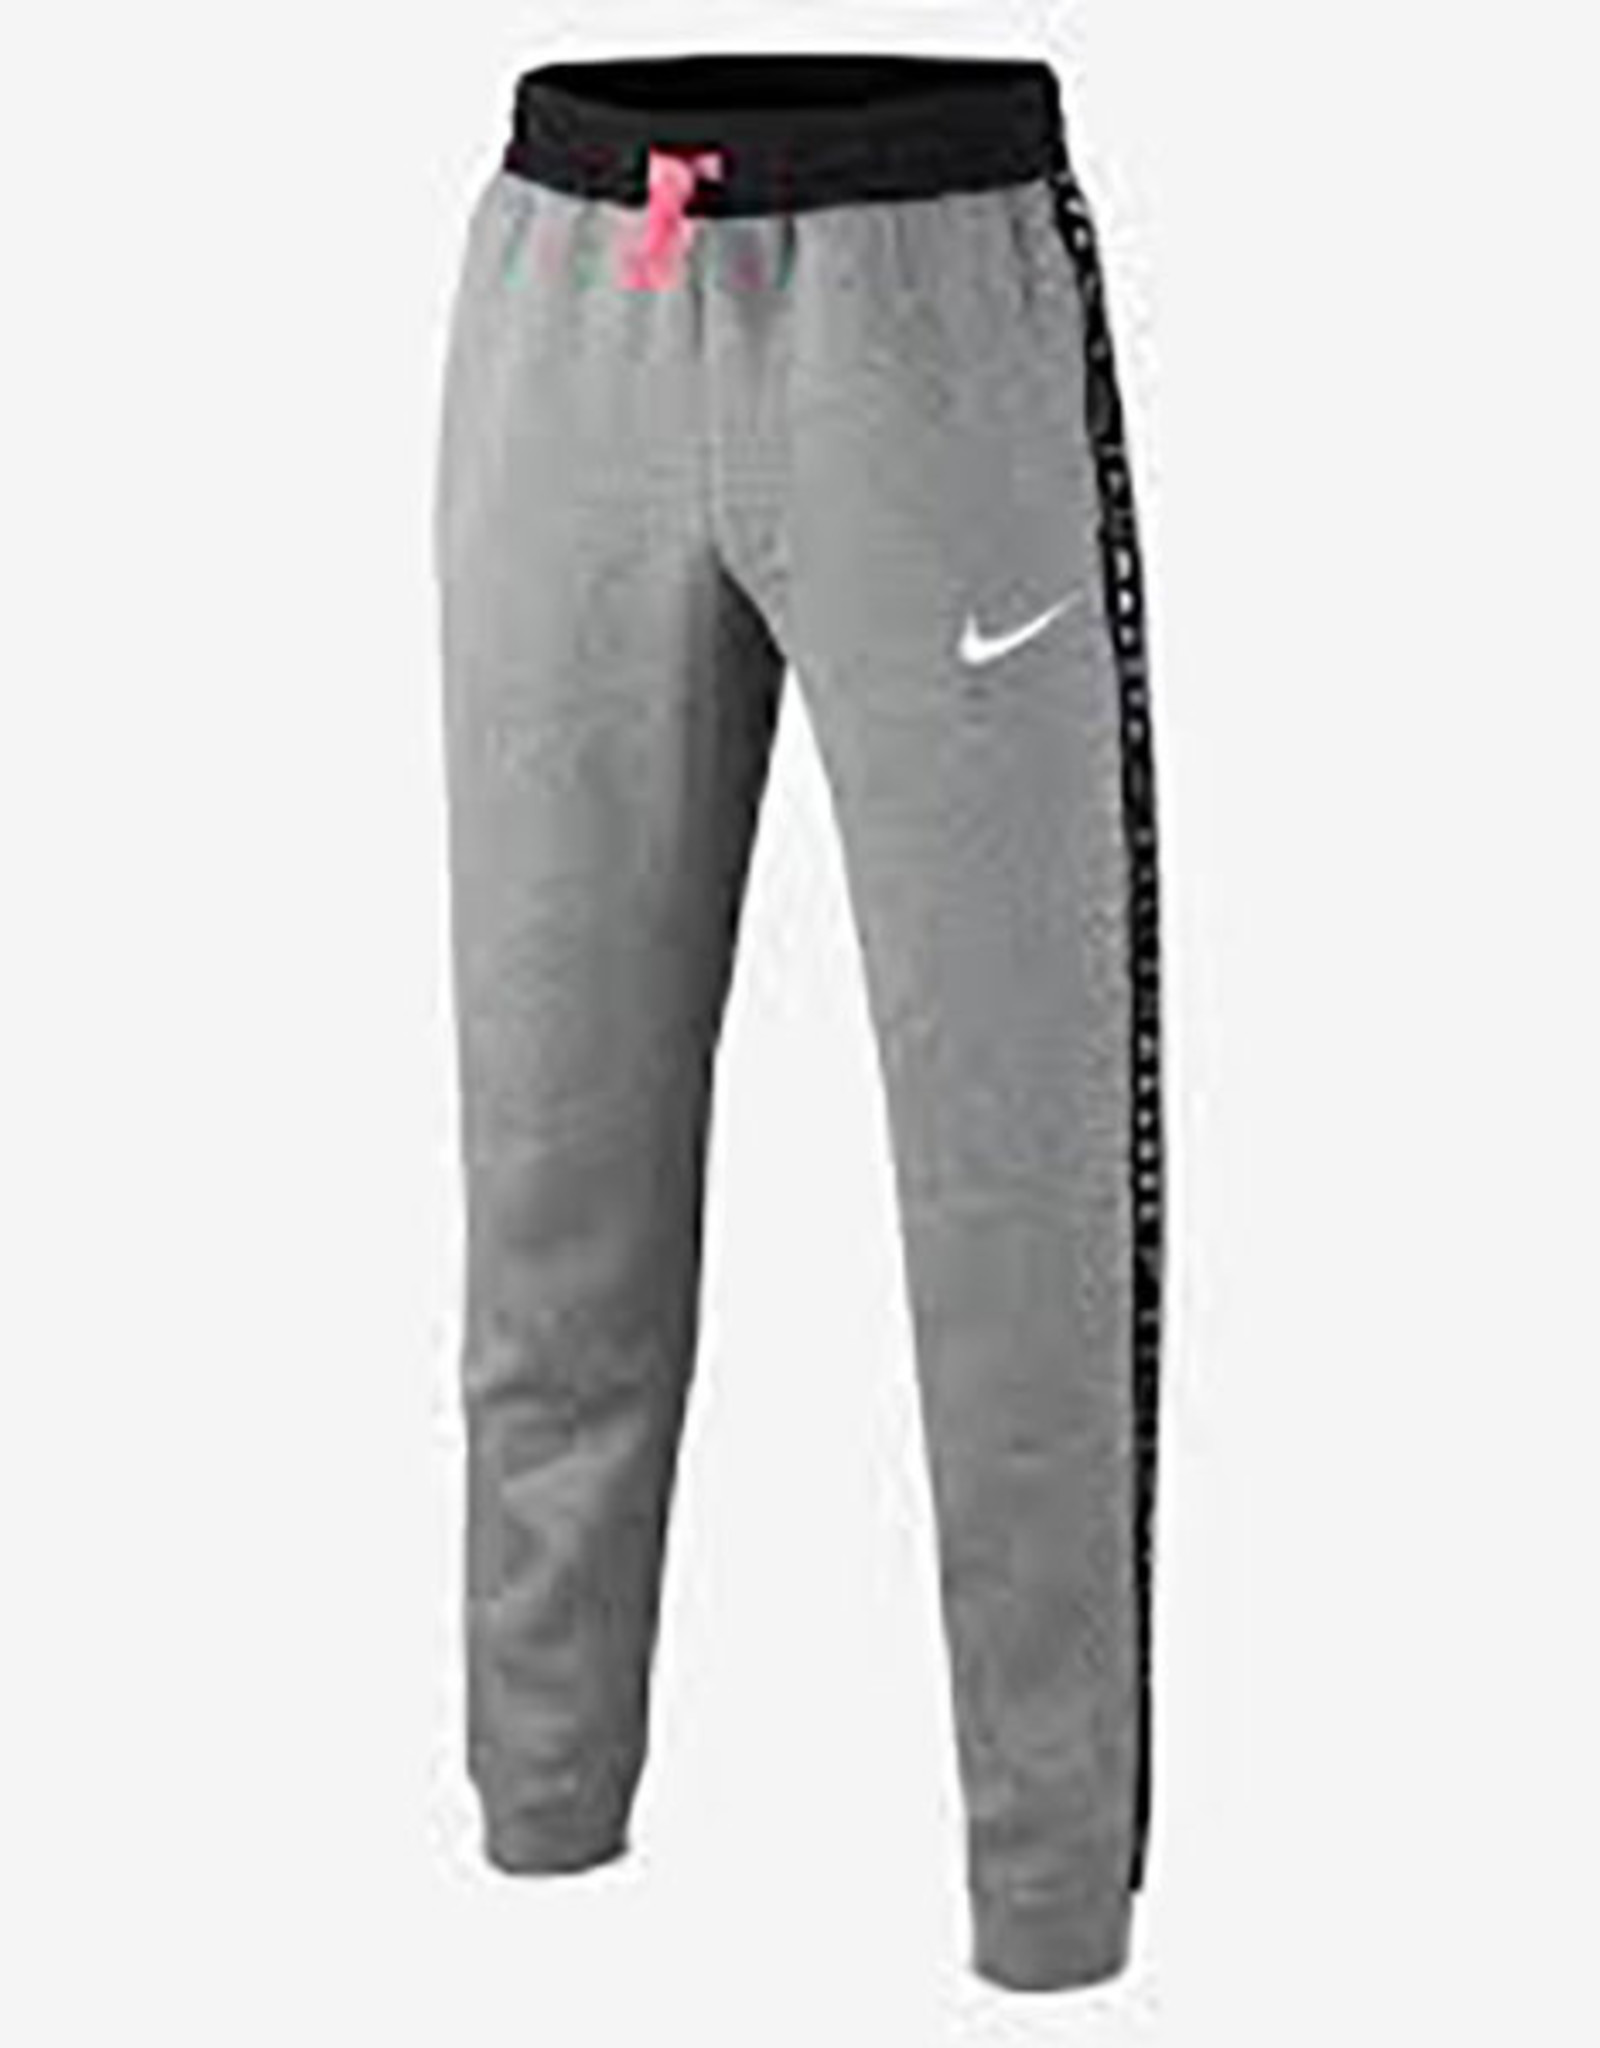 Nike Dri-Fit Broek Kylian Mbappe